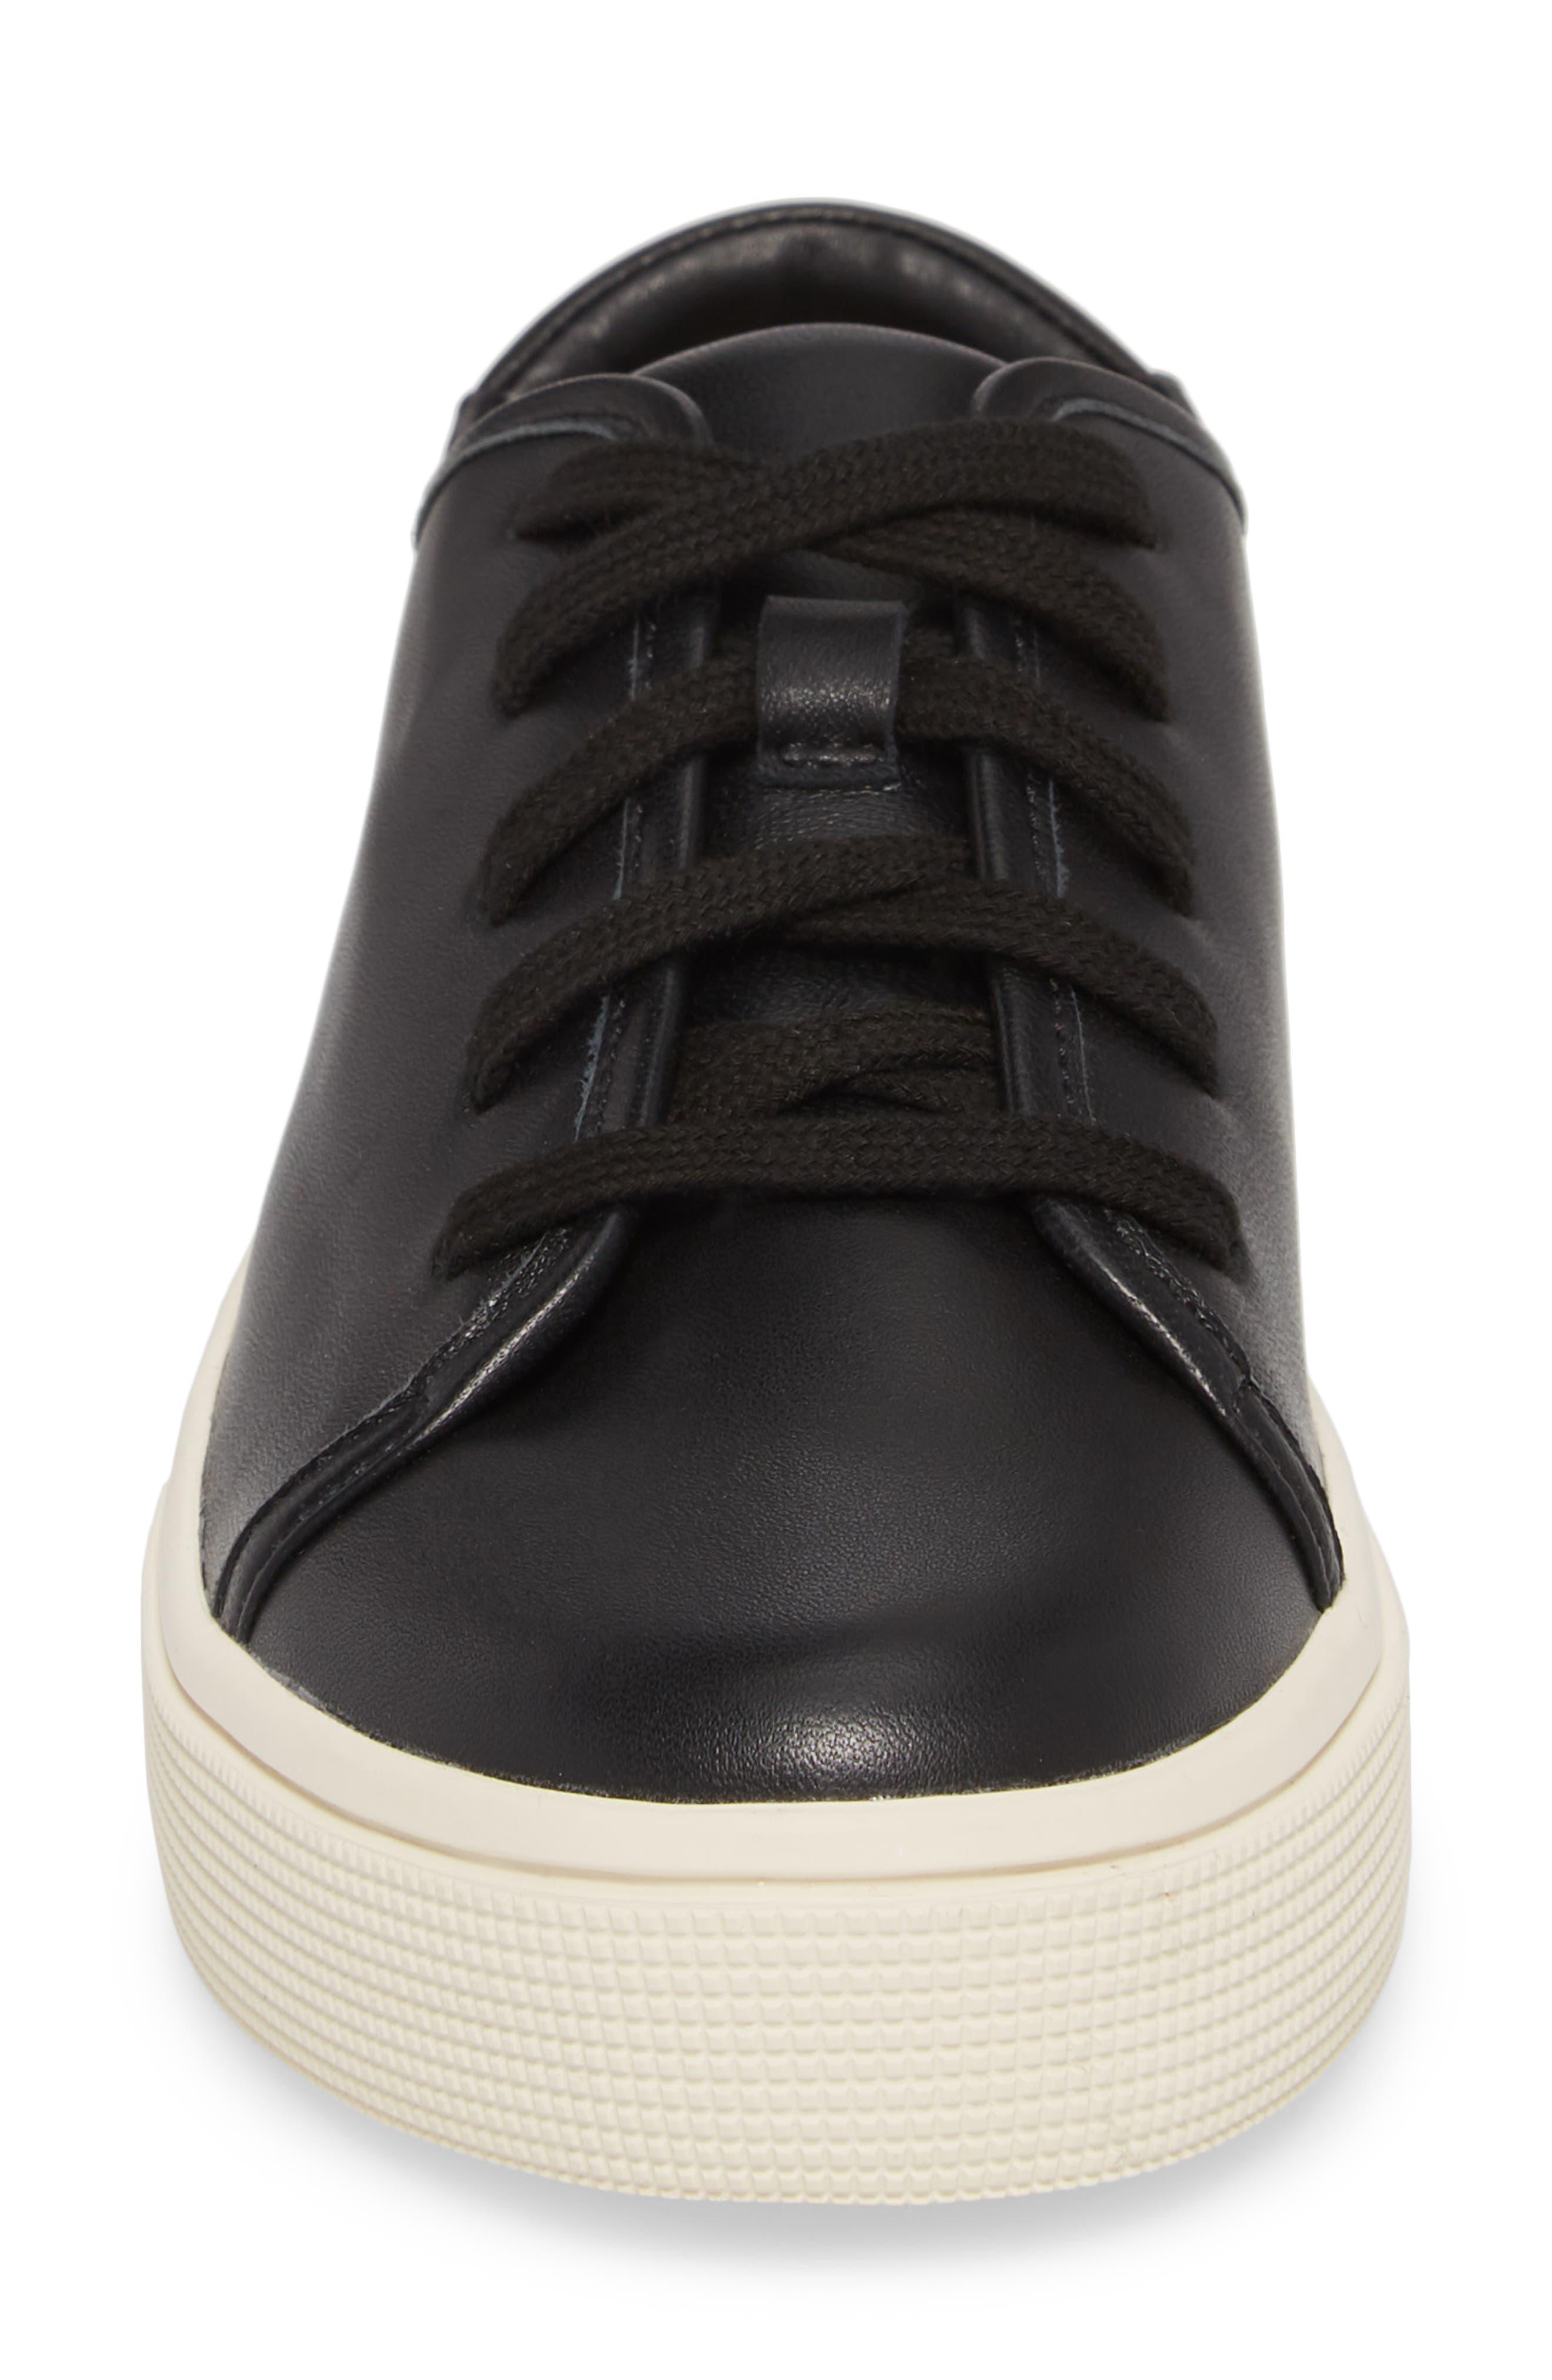 Norvin Sneaker,                             Alternate thumbnail 4, color,                             BLACK LEATHER